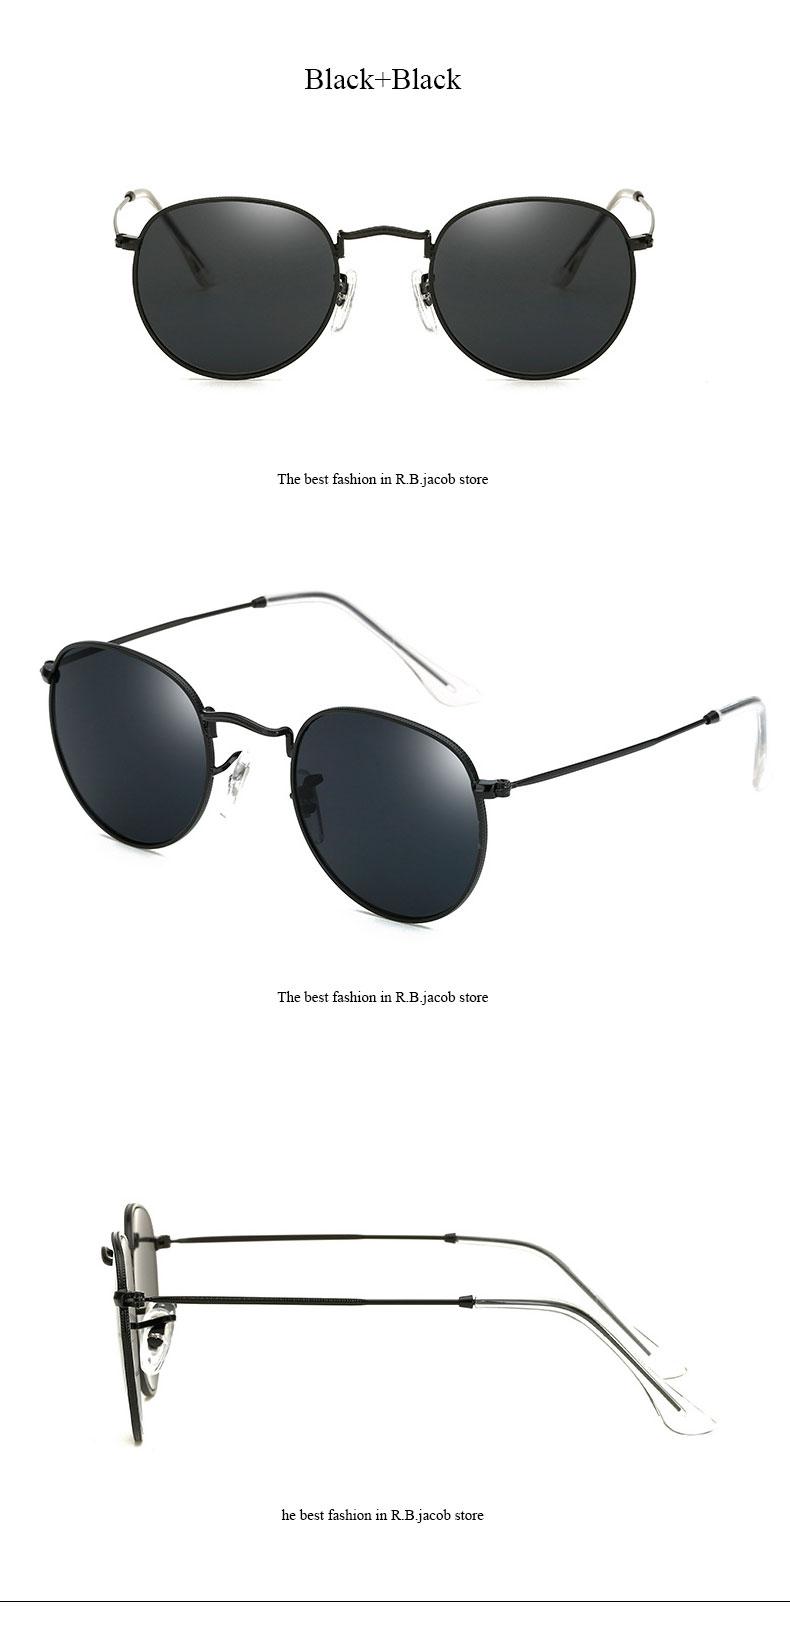 HTB1peXOQVXXXXazaXXXq6xXFXXXX - Round Sunglasses Women Retro Brand Designer Classic Rose Gold Steampunk Sun Glasses Men UV400 Rayed Mirror Female UV400